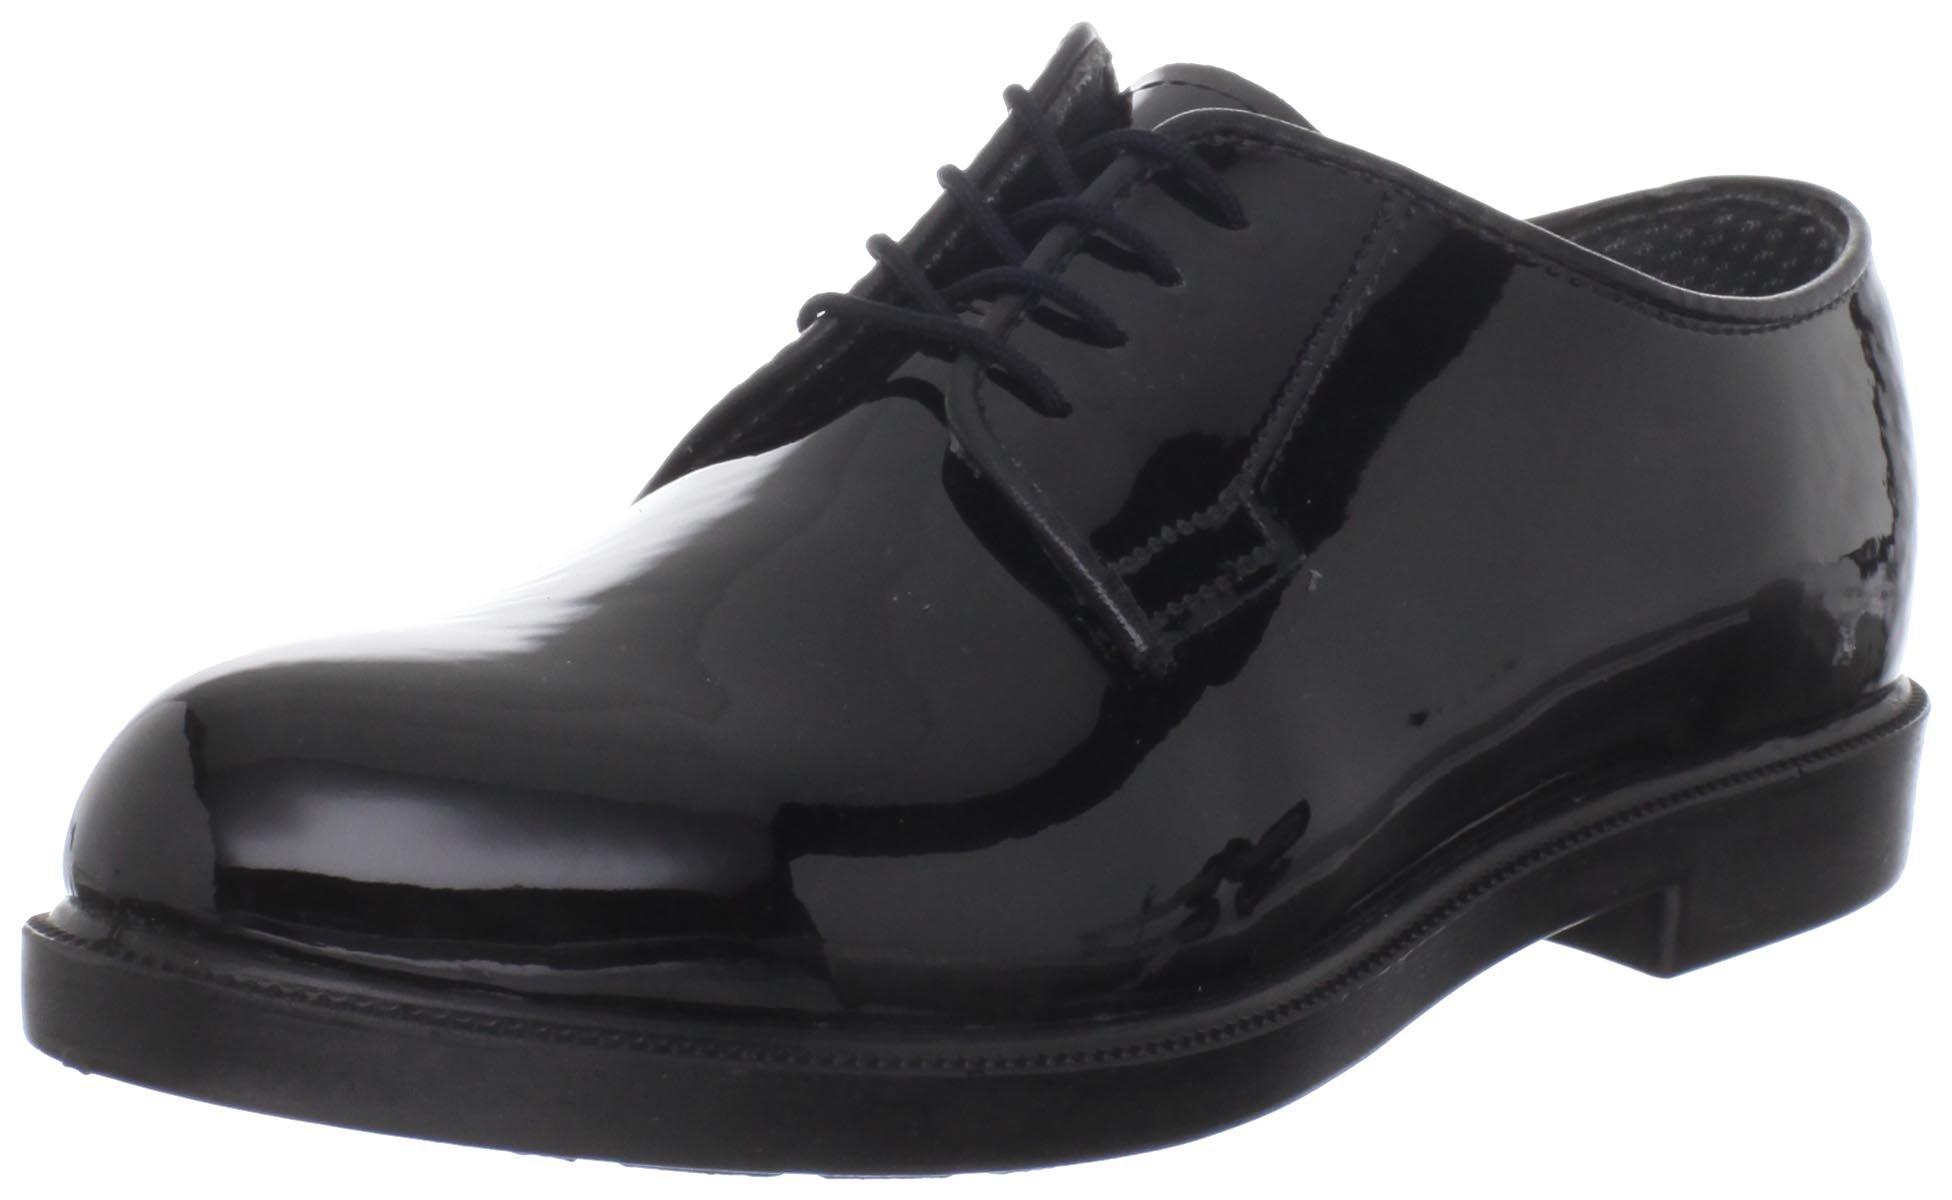 Women's Bates High Gloss DuraShocks® Oxford (5.5 EW in Black)